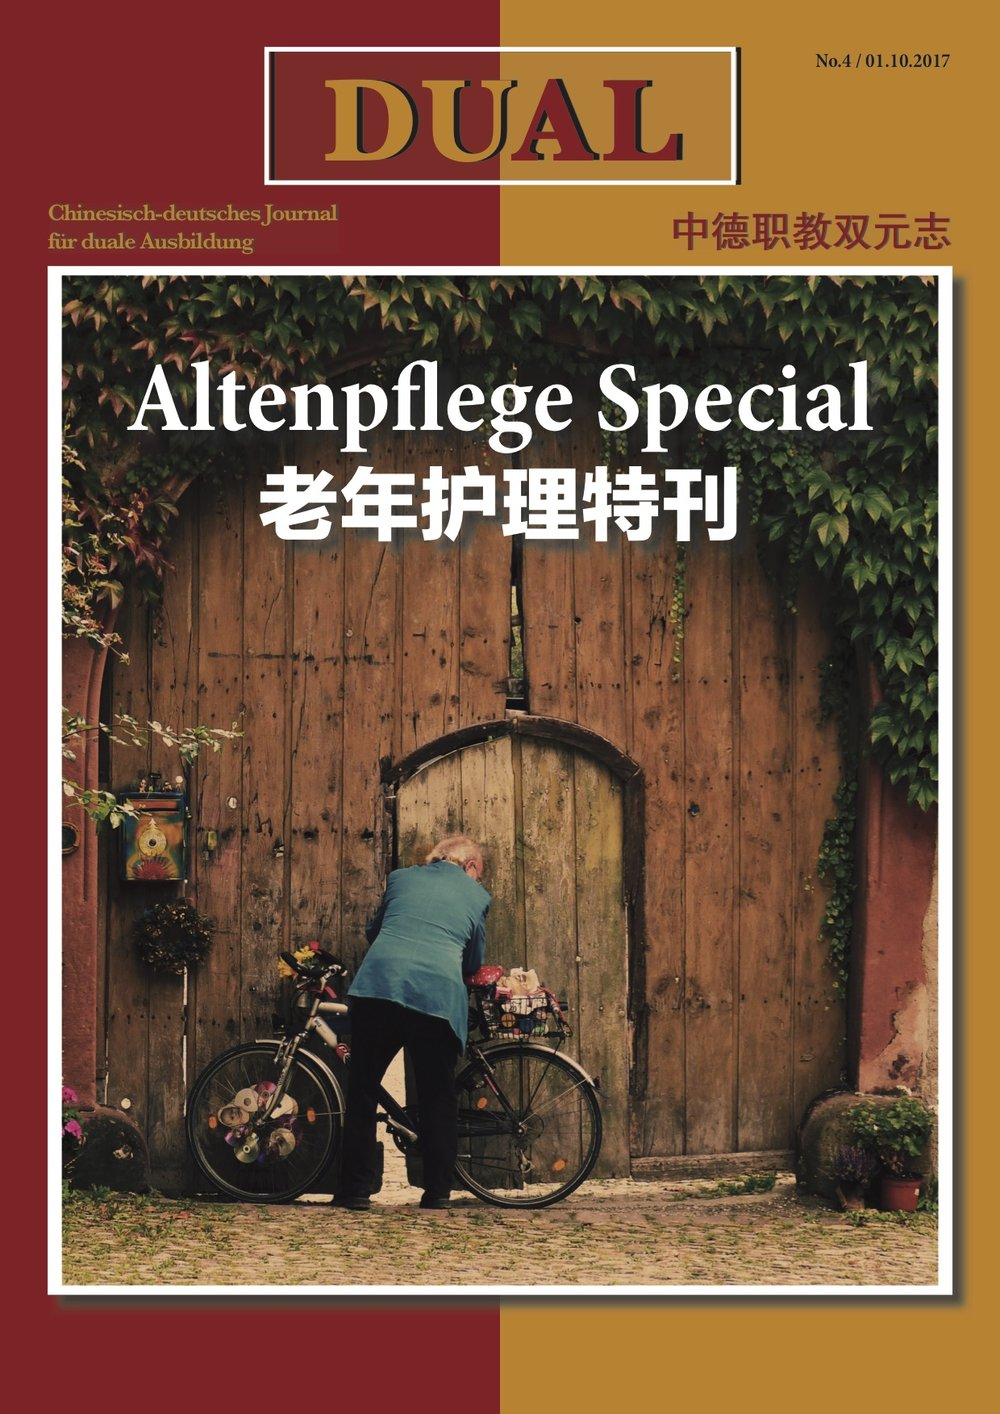 2017.ASC.Altenpflege Special.jpg